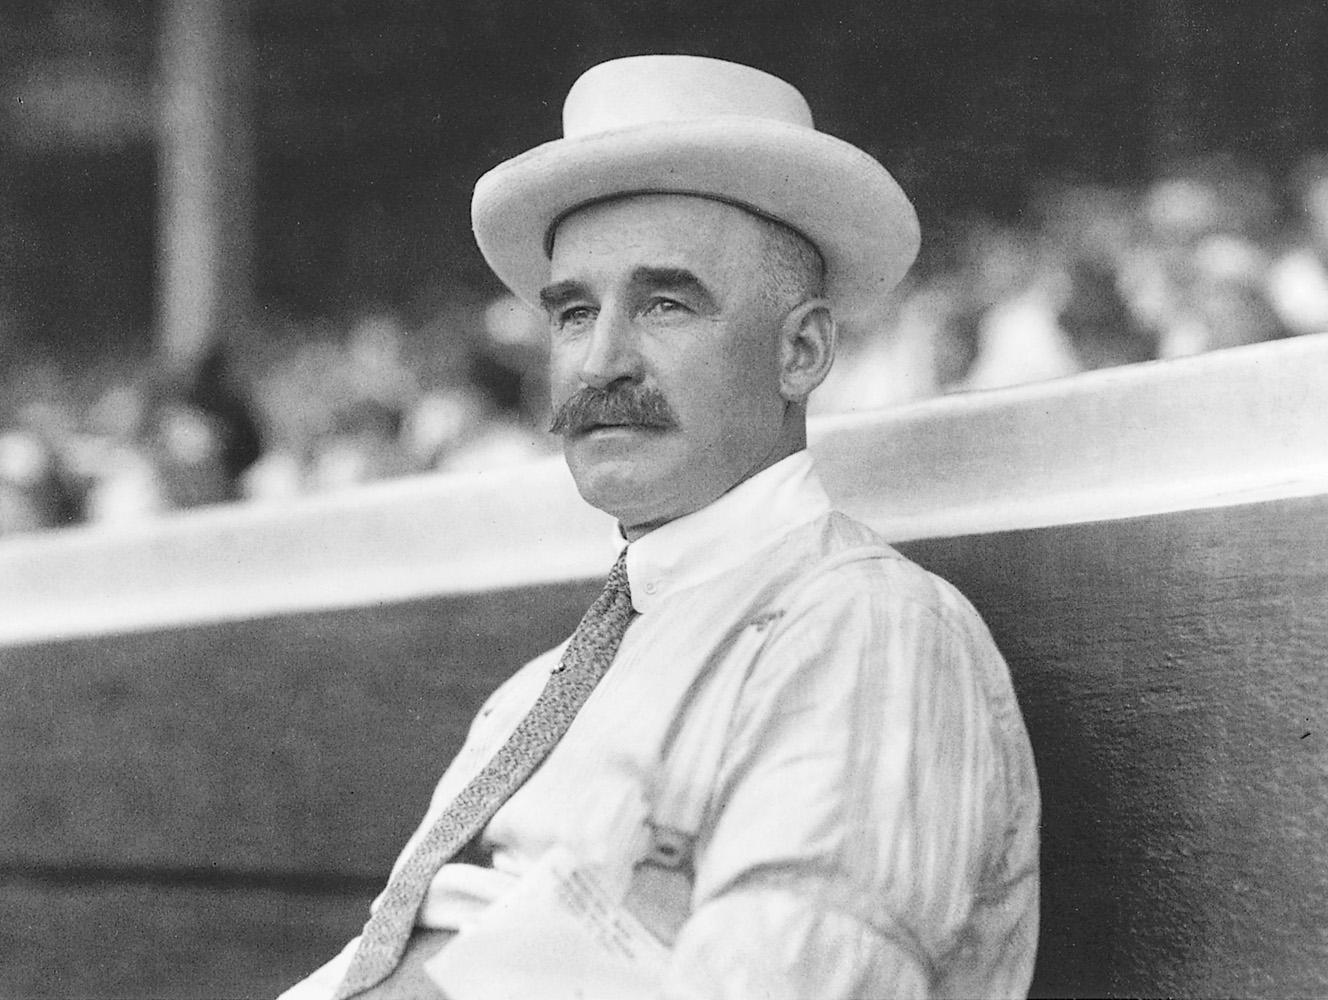 Joseph Lannin, Boston Red Sox Owner, circa 1914.